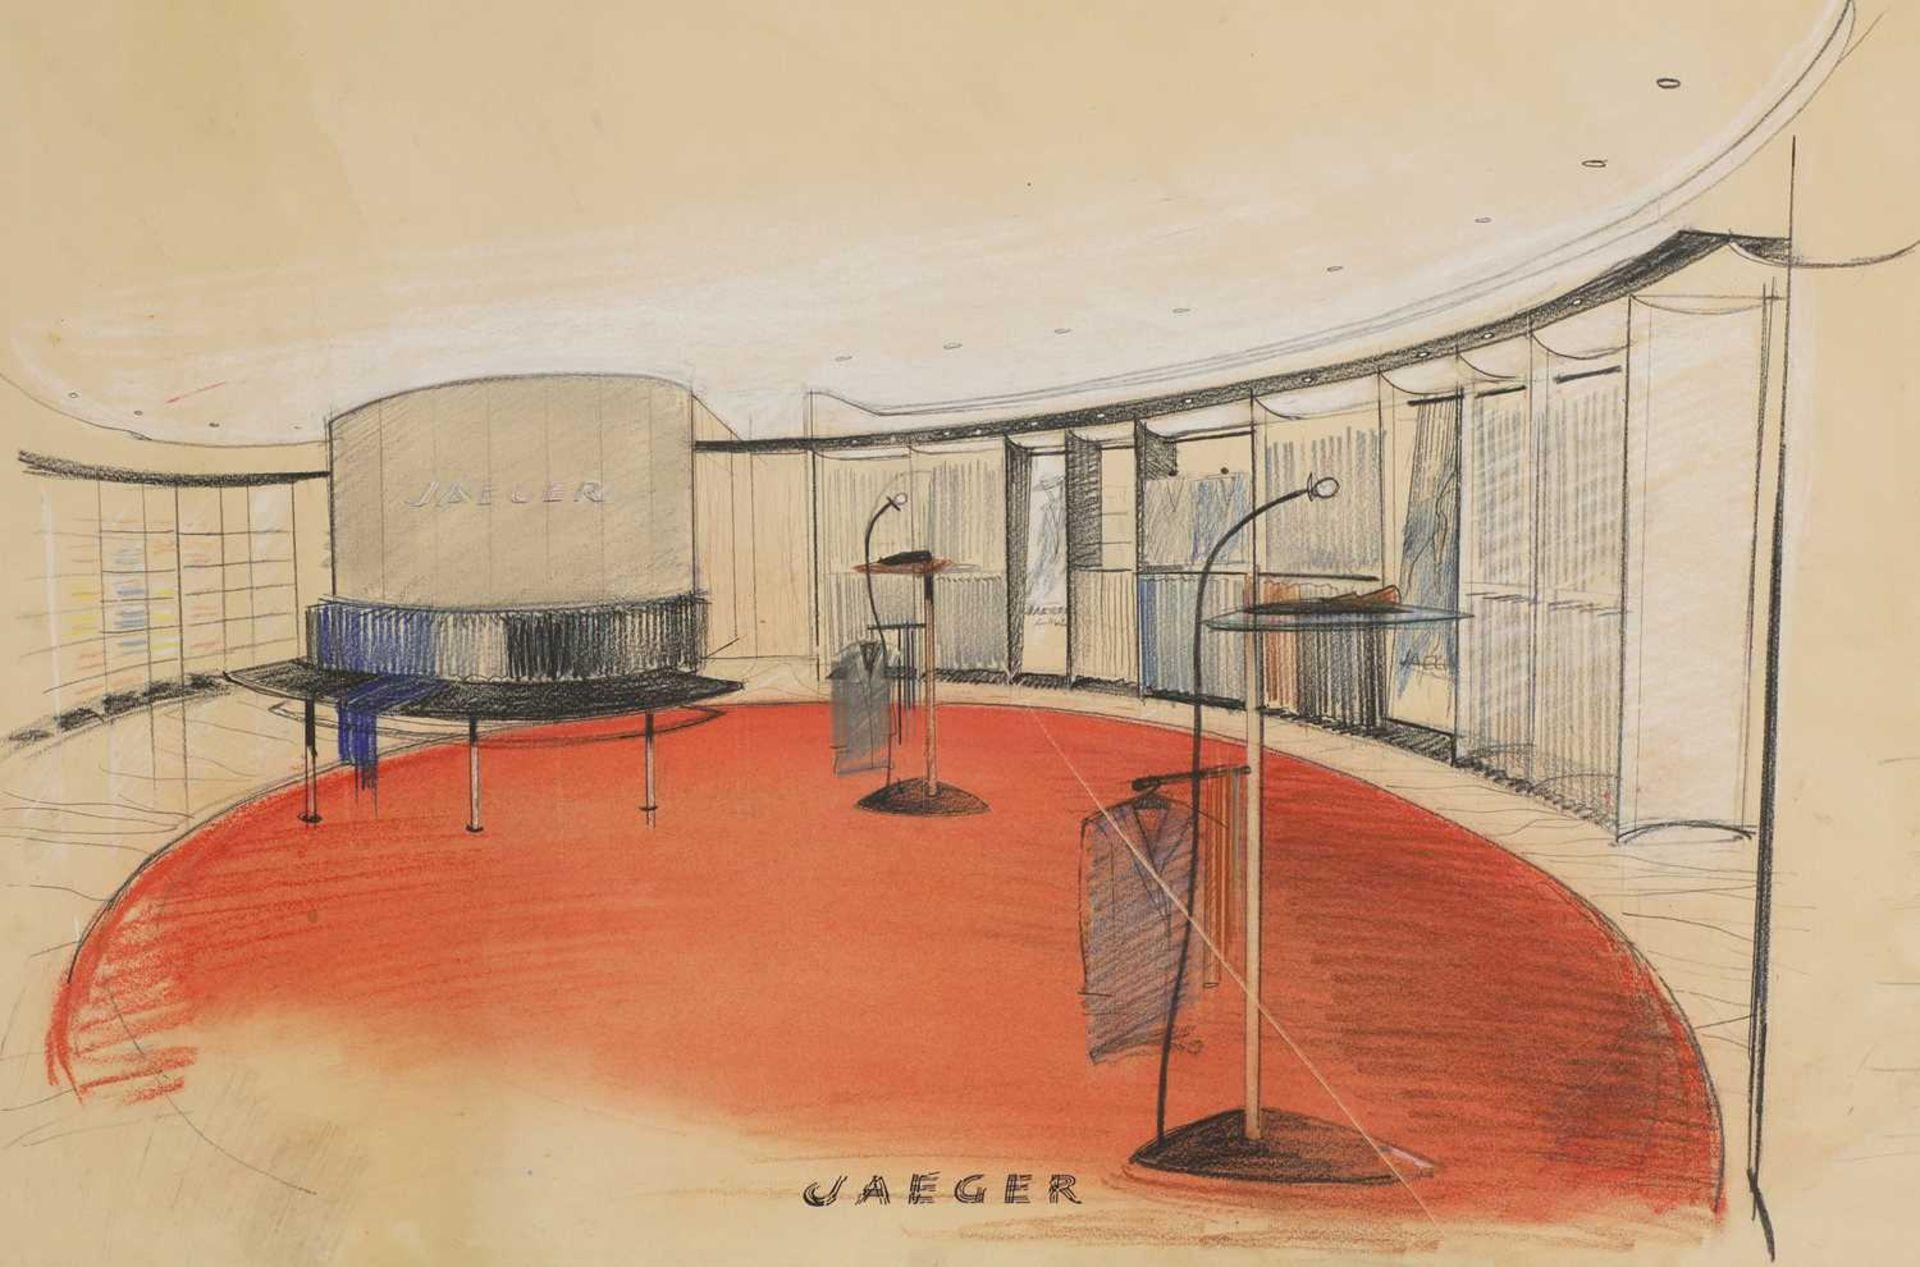 Maurice Broughton Associates, - Image 5 of 7